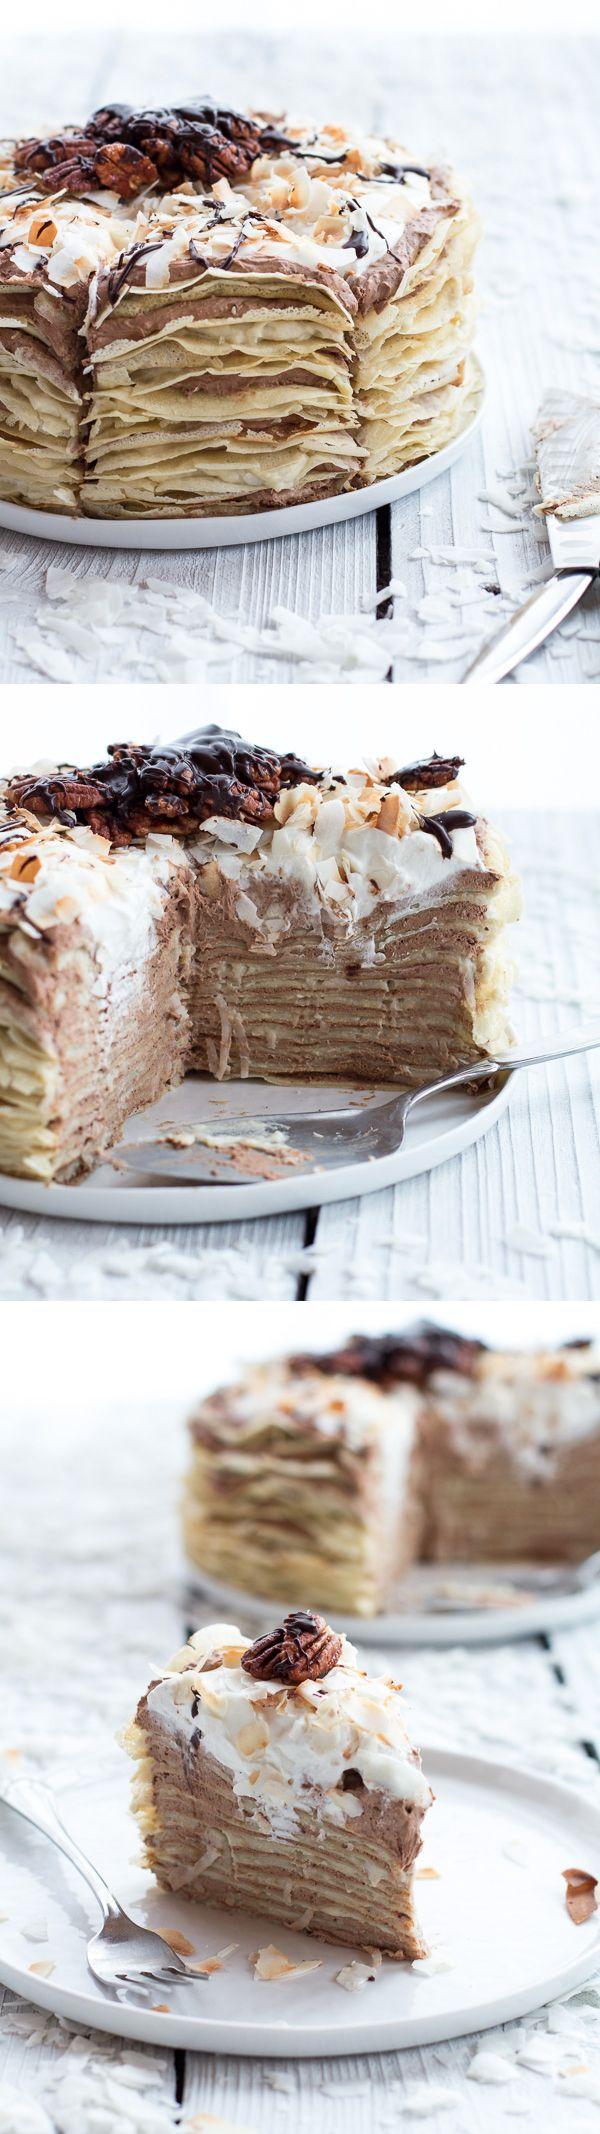 chocolate mousse rum crepe cake recipe layers pancakes kremsnite torta recept how to easy better baking bible blog